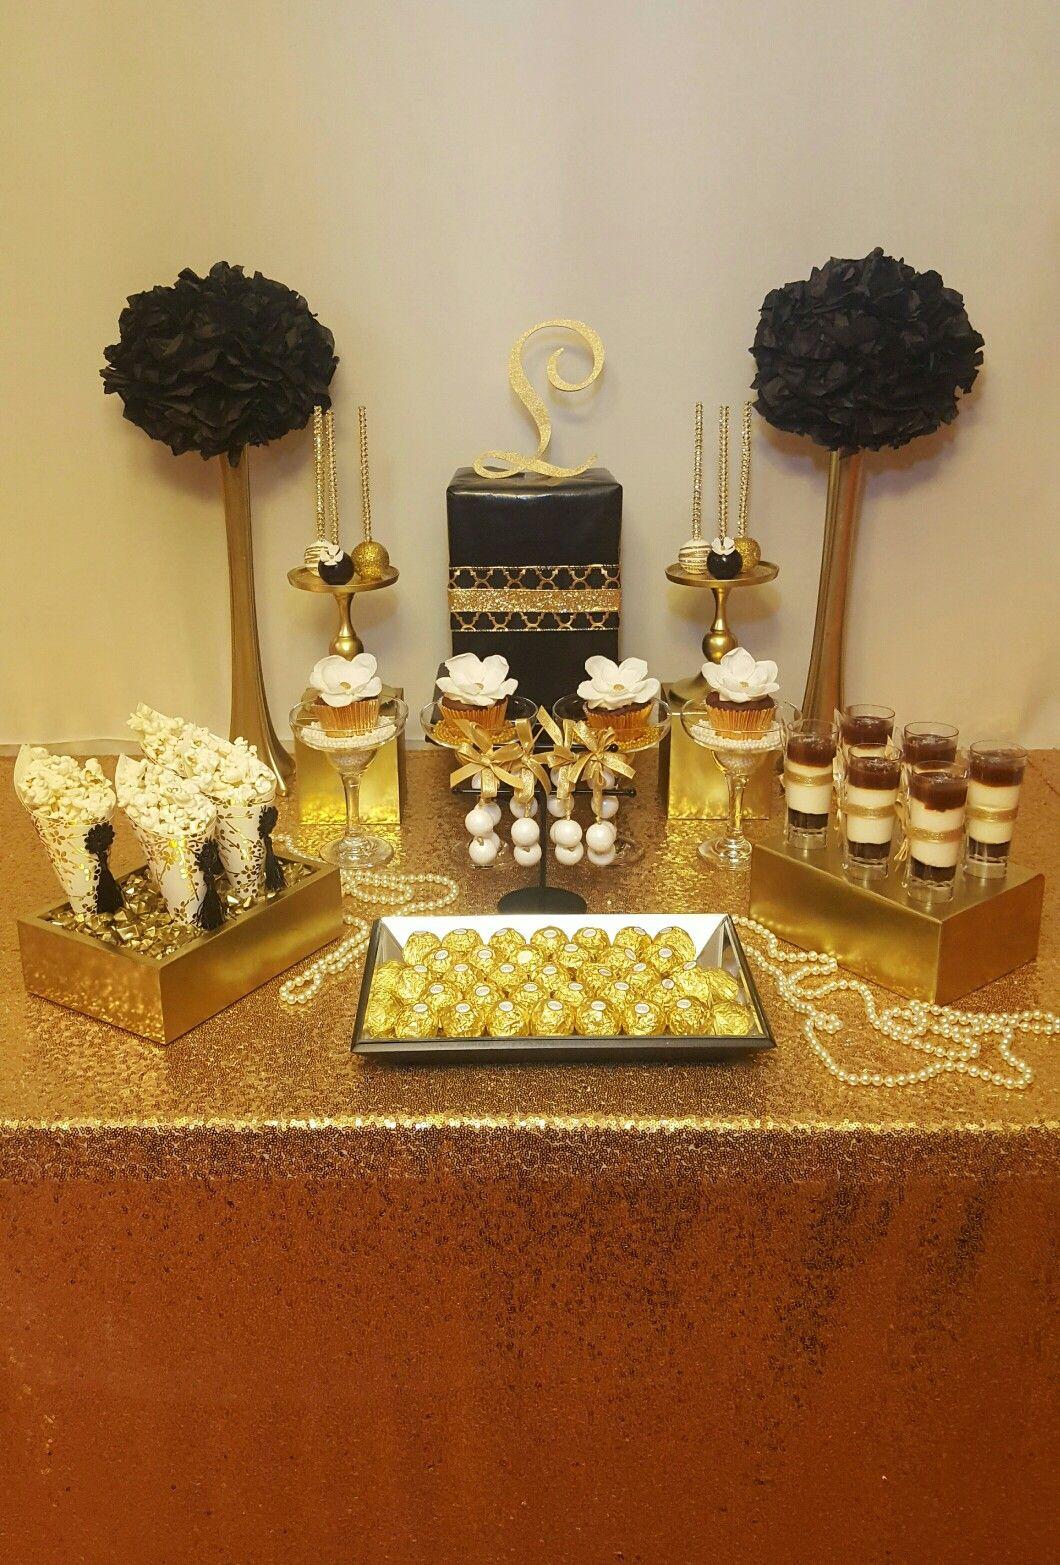 Gold And Black Themed Dessert Table Gold Dessert Table Black